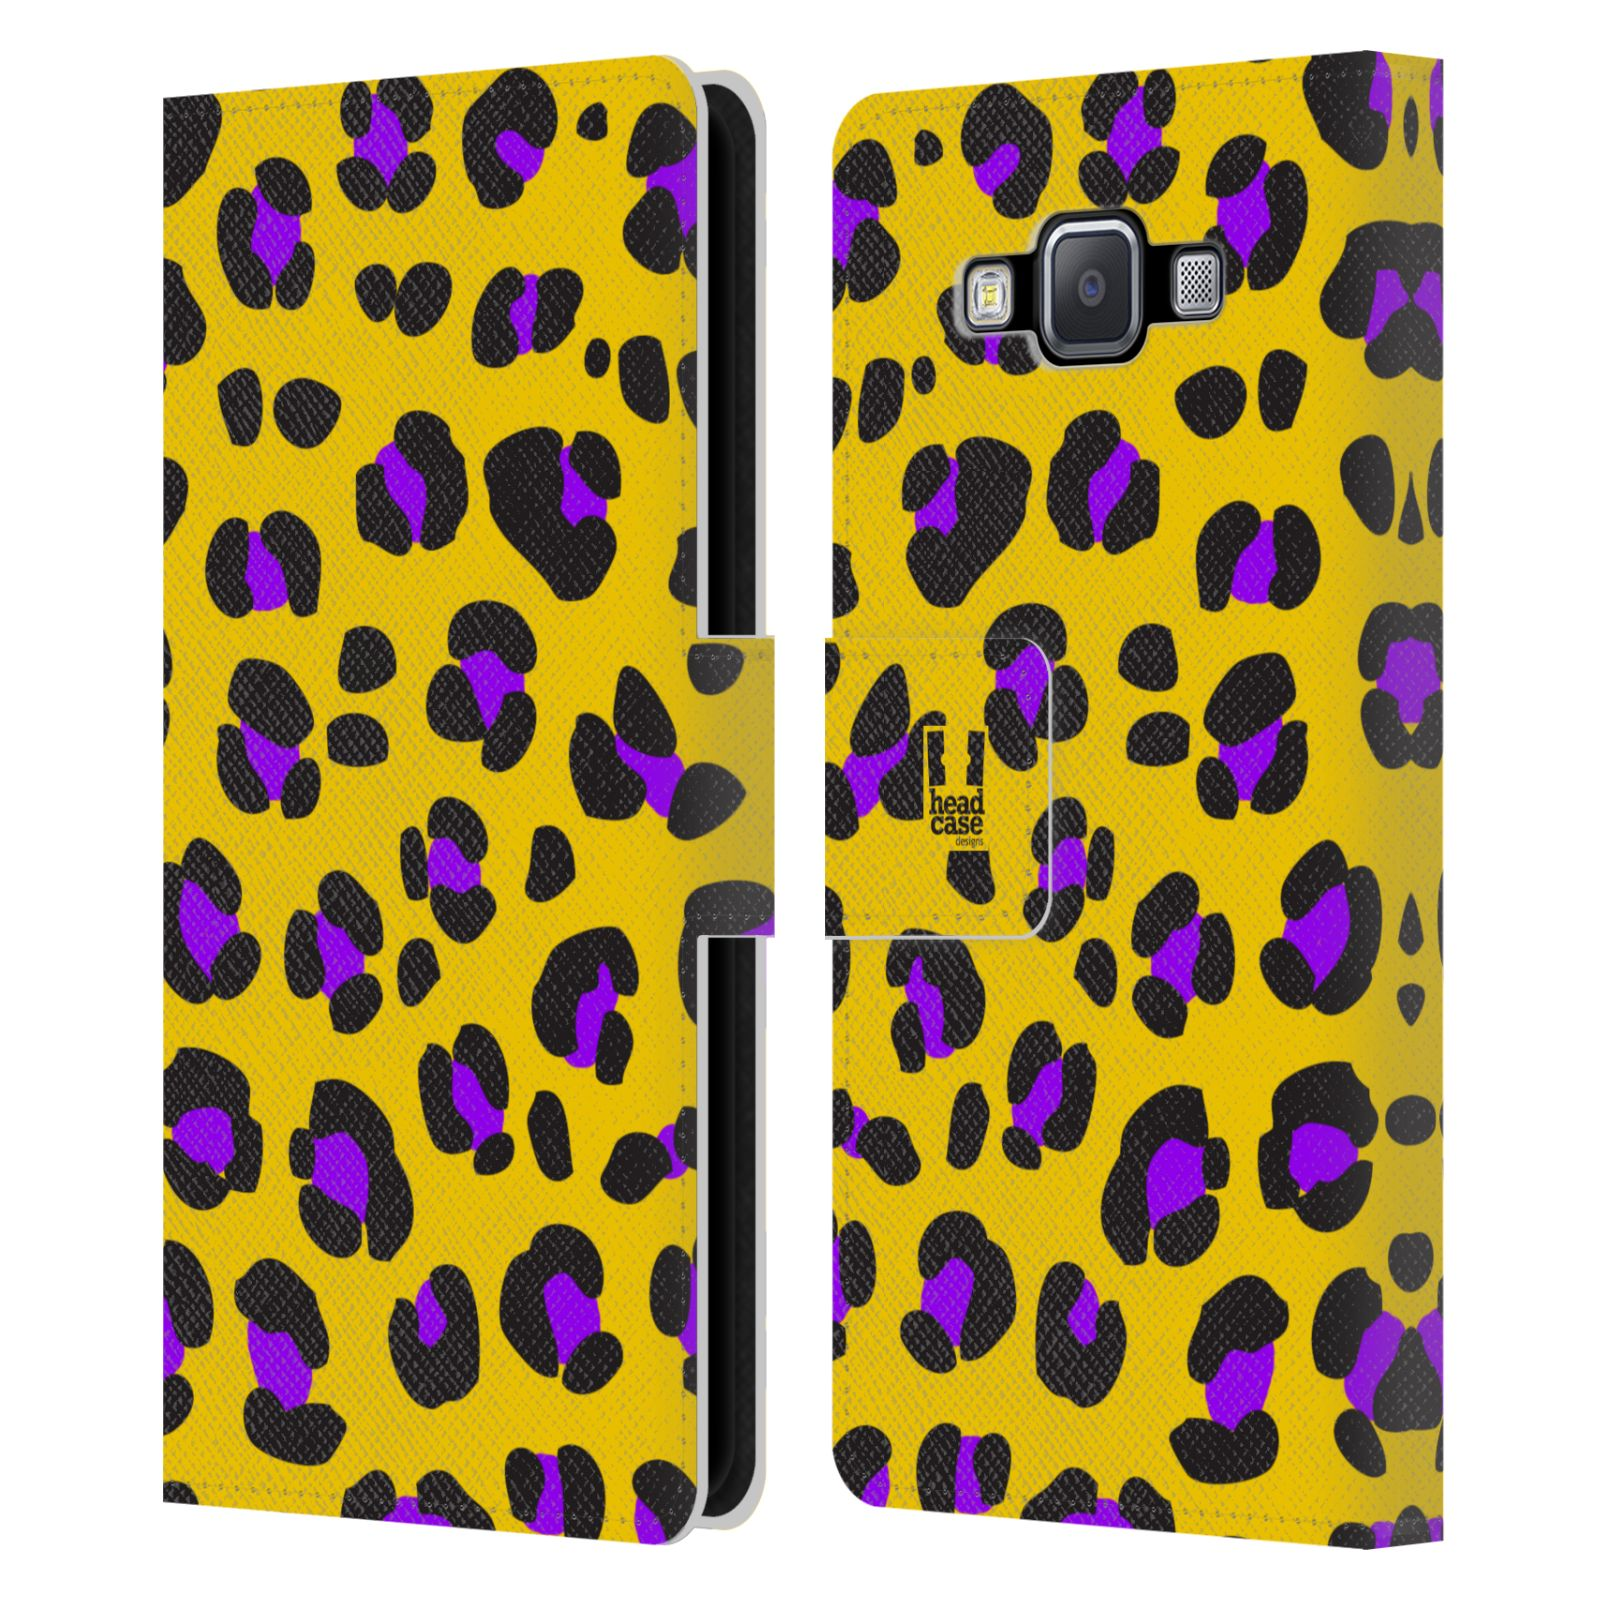 HEAD CASE Flipové pouzdro pro mobil Samsung Galaxy A5 Zvířecí barevné vzory žlutý leopard fialové skvrny